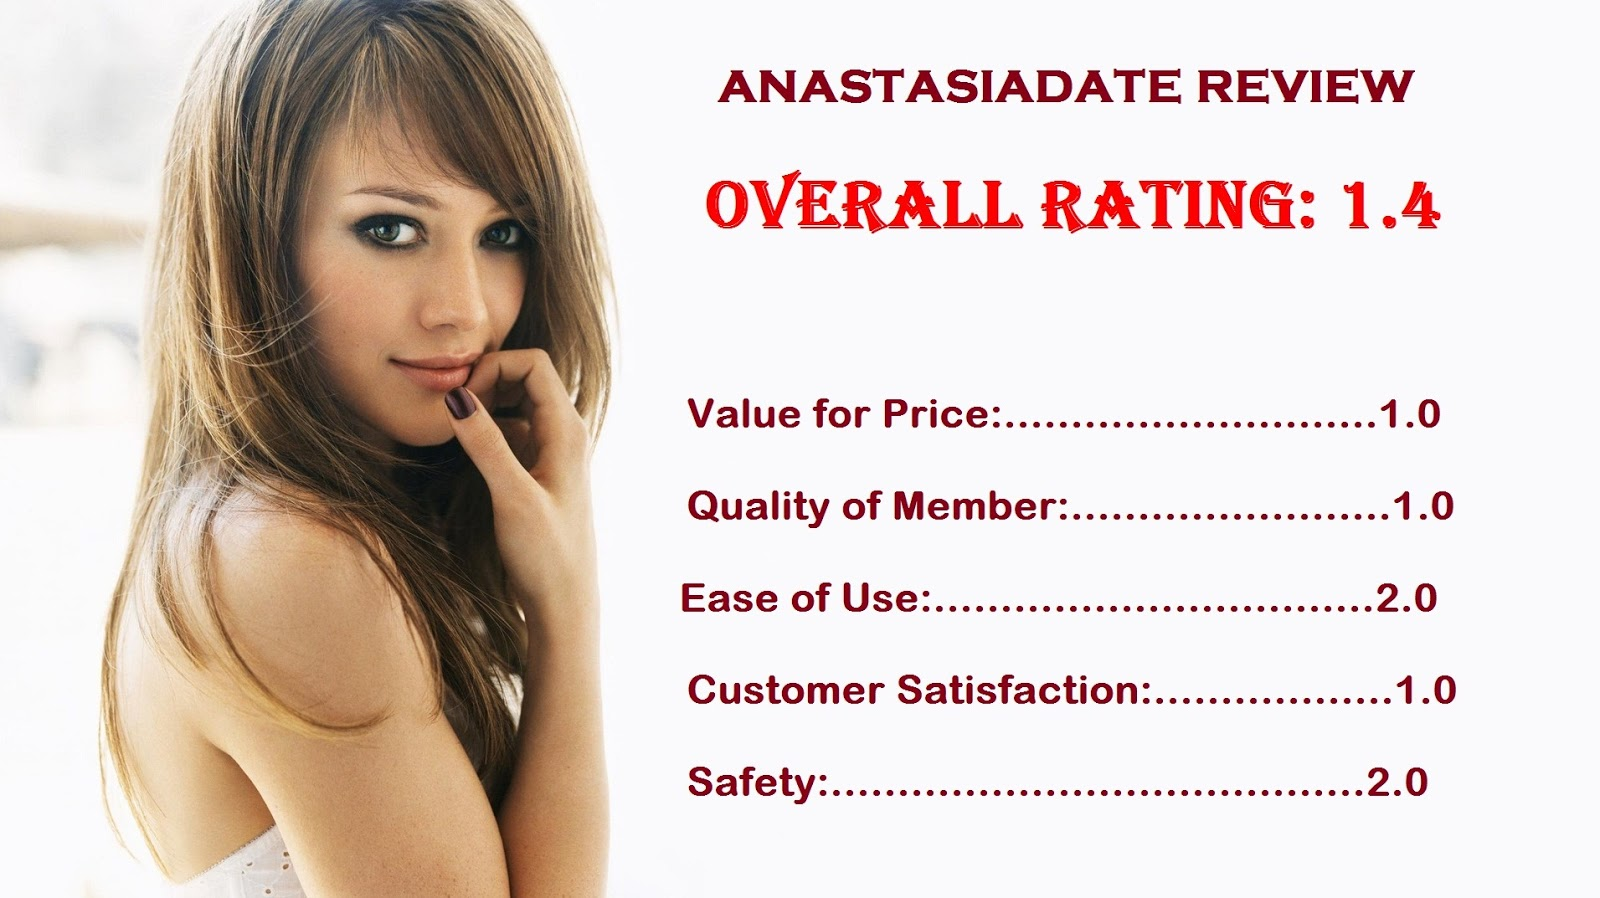 What is anastasiadate com